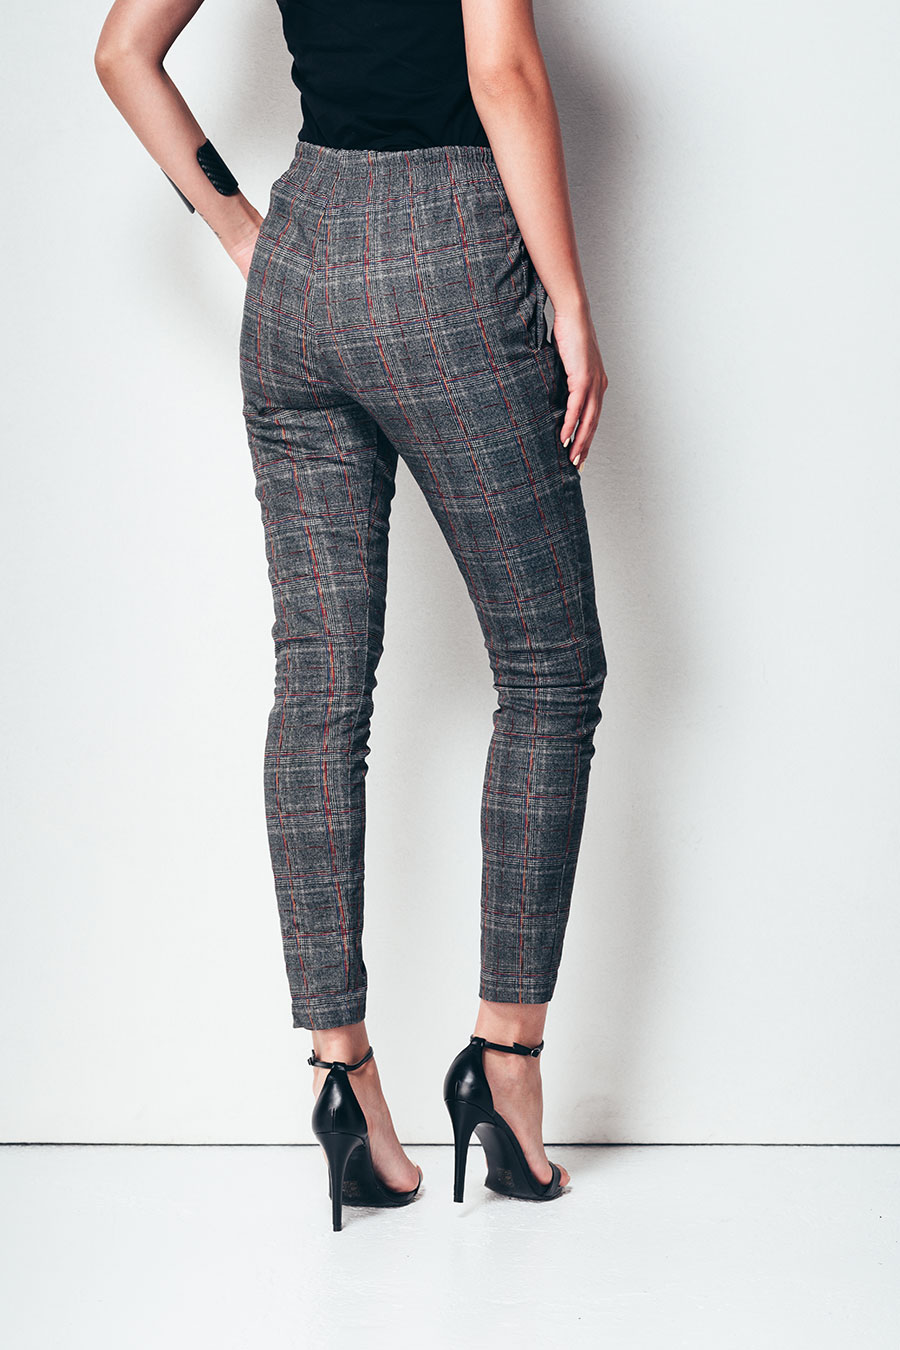 jagger internet prodavnica kolekcija jesen zima 2021 zenske pantalone jg 1150 05 1